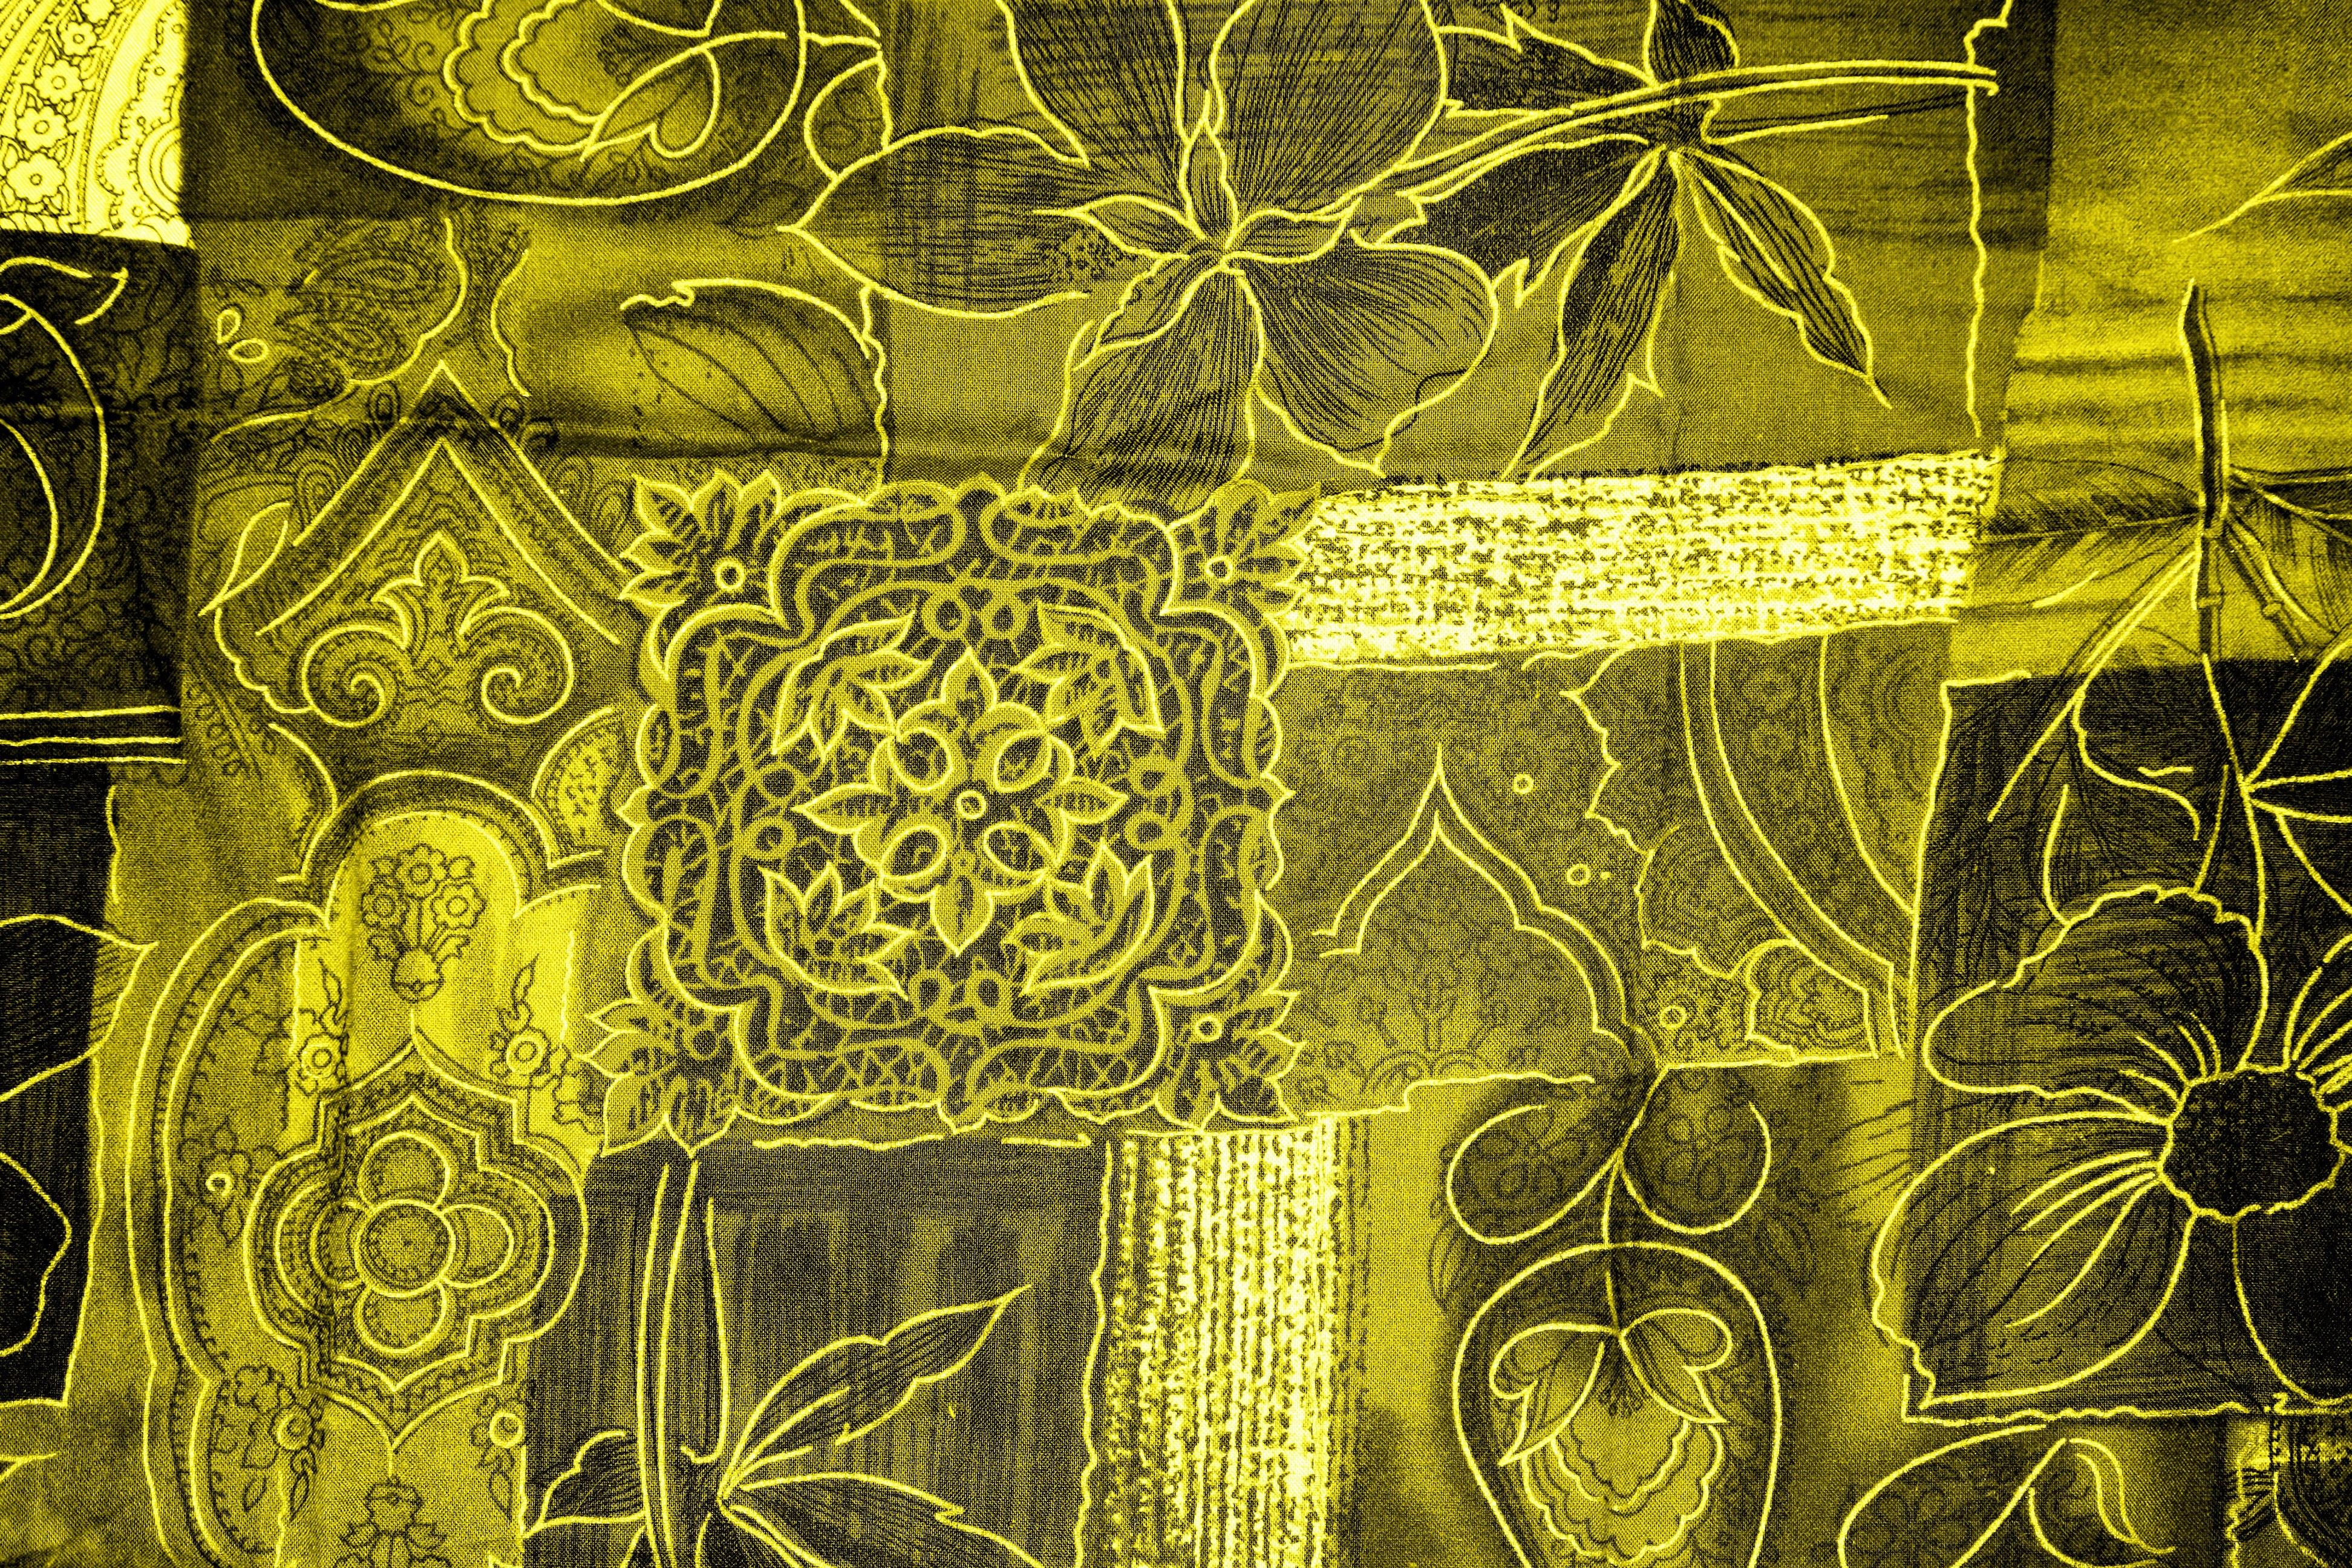 Flowers Fabric Close Up Patchwork Textile Colors Background Illustration Design Symmetry Wallpaper Tapestry Boss Silk Screenshot Golden